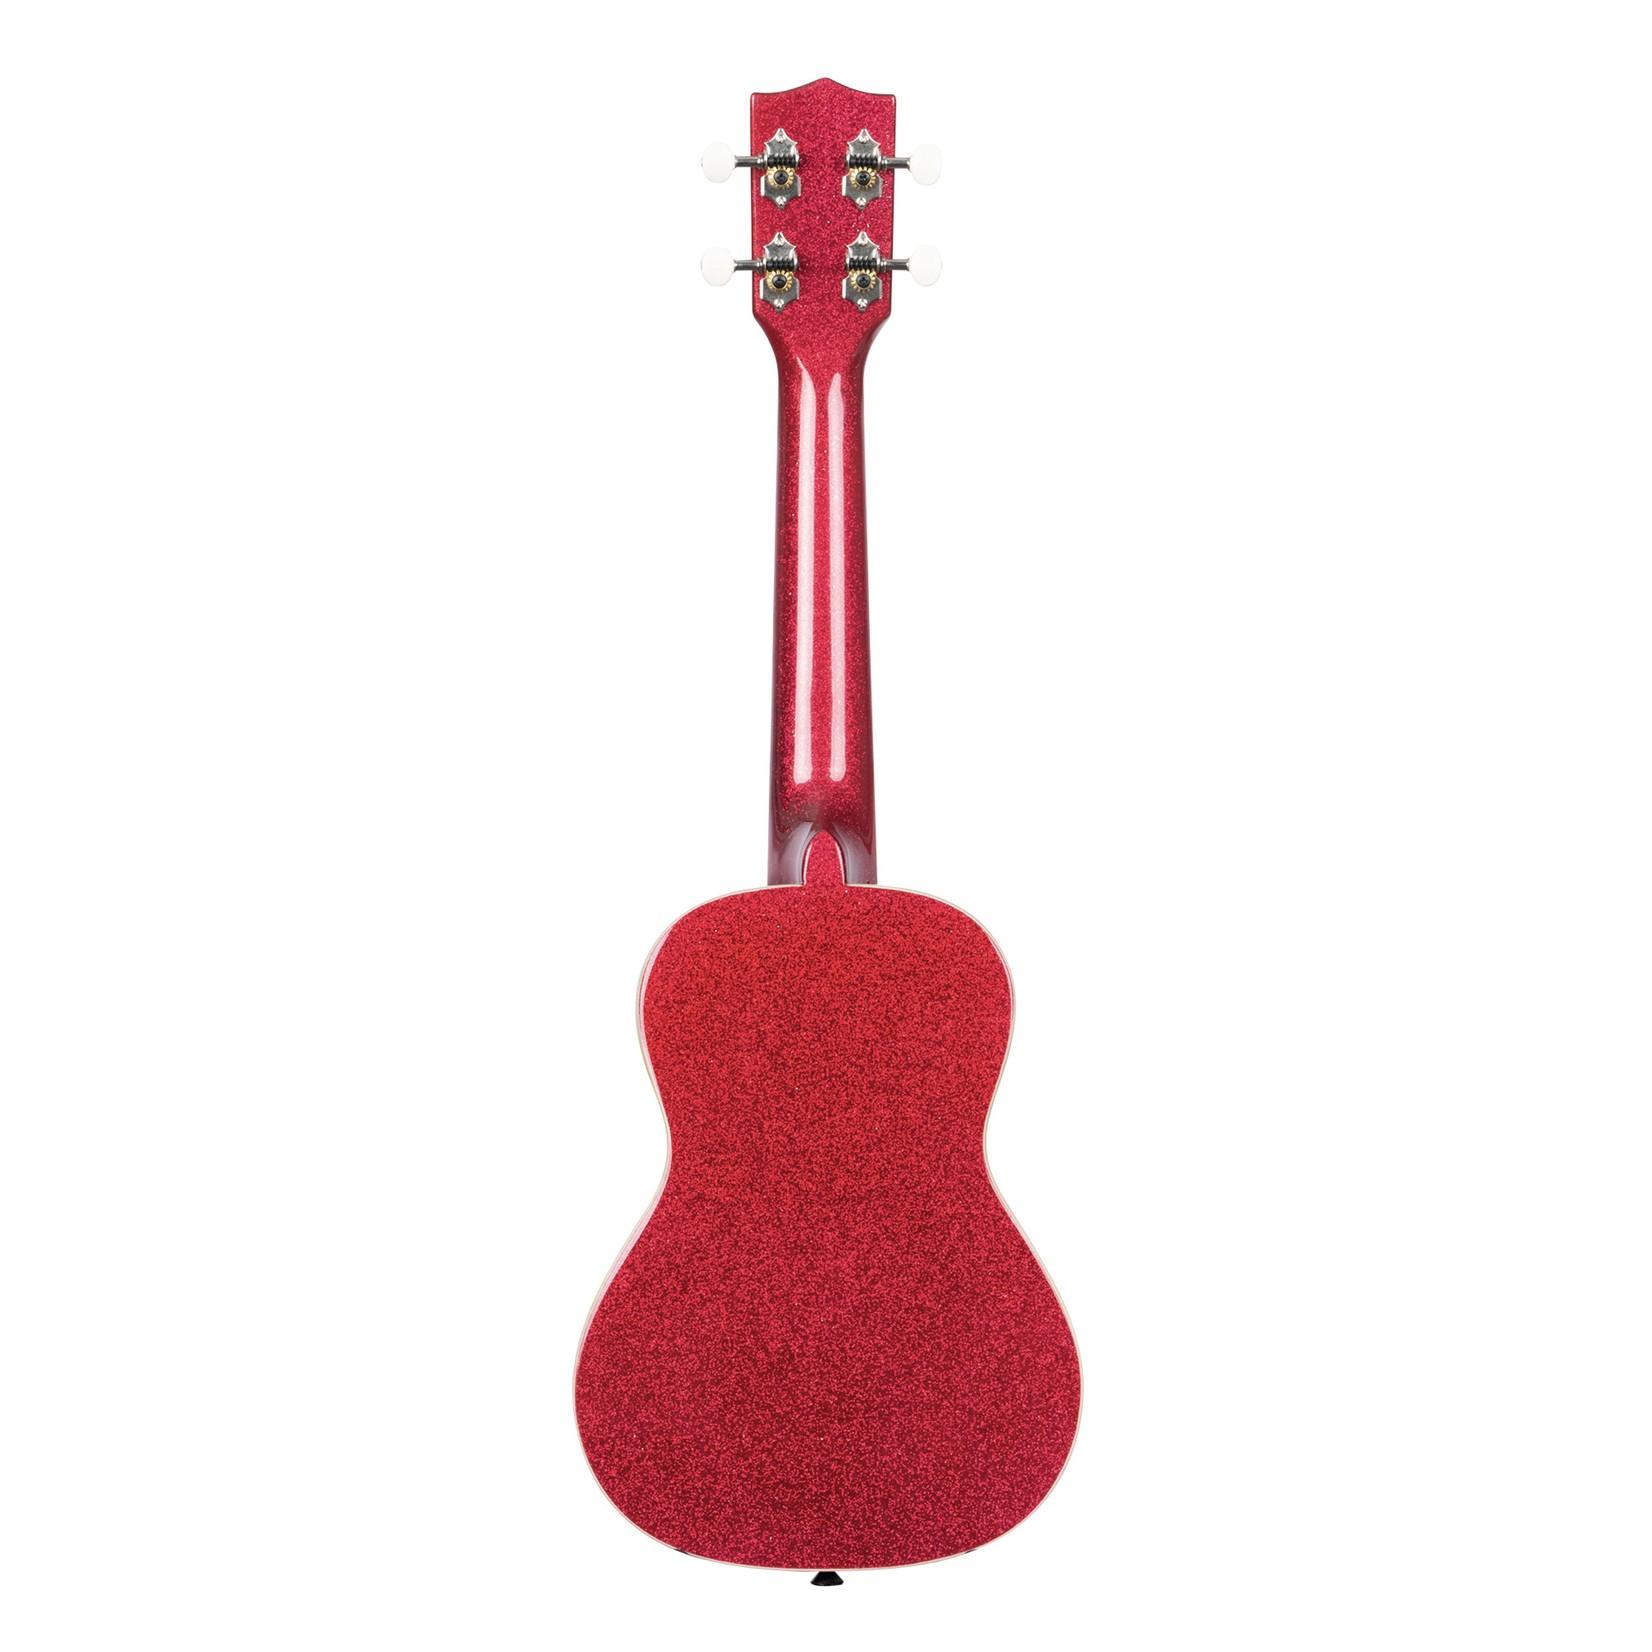 Kala Kala Sparkle Series Concert Ukulele, Ritzy Red